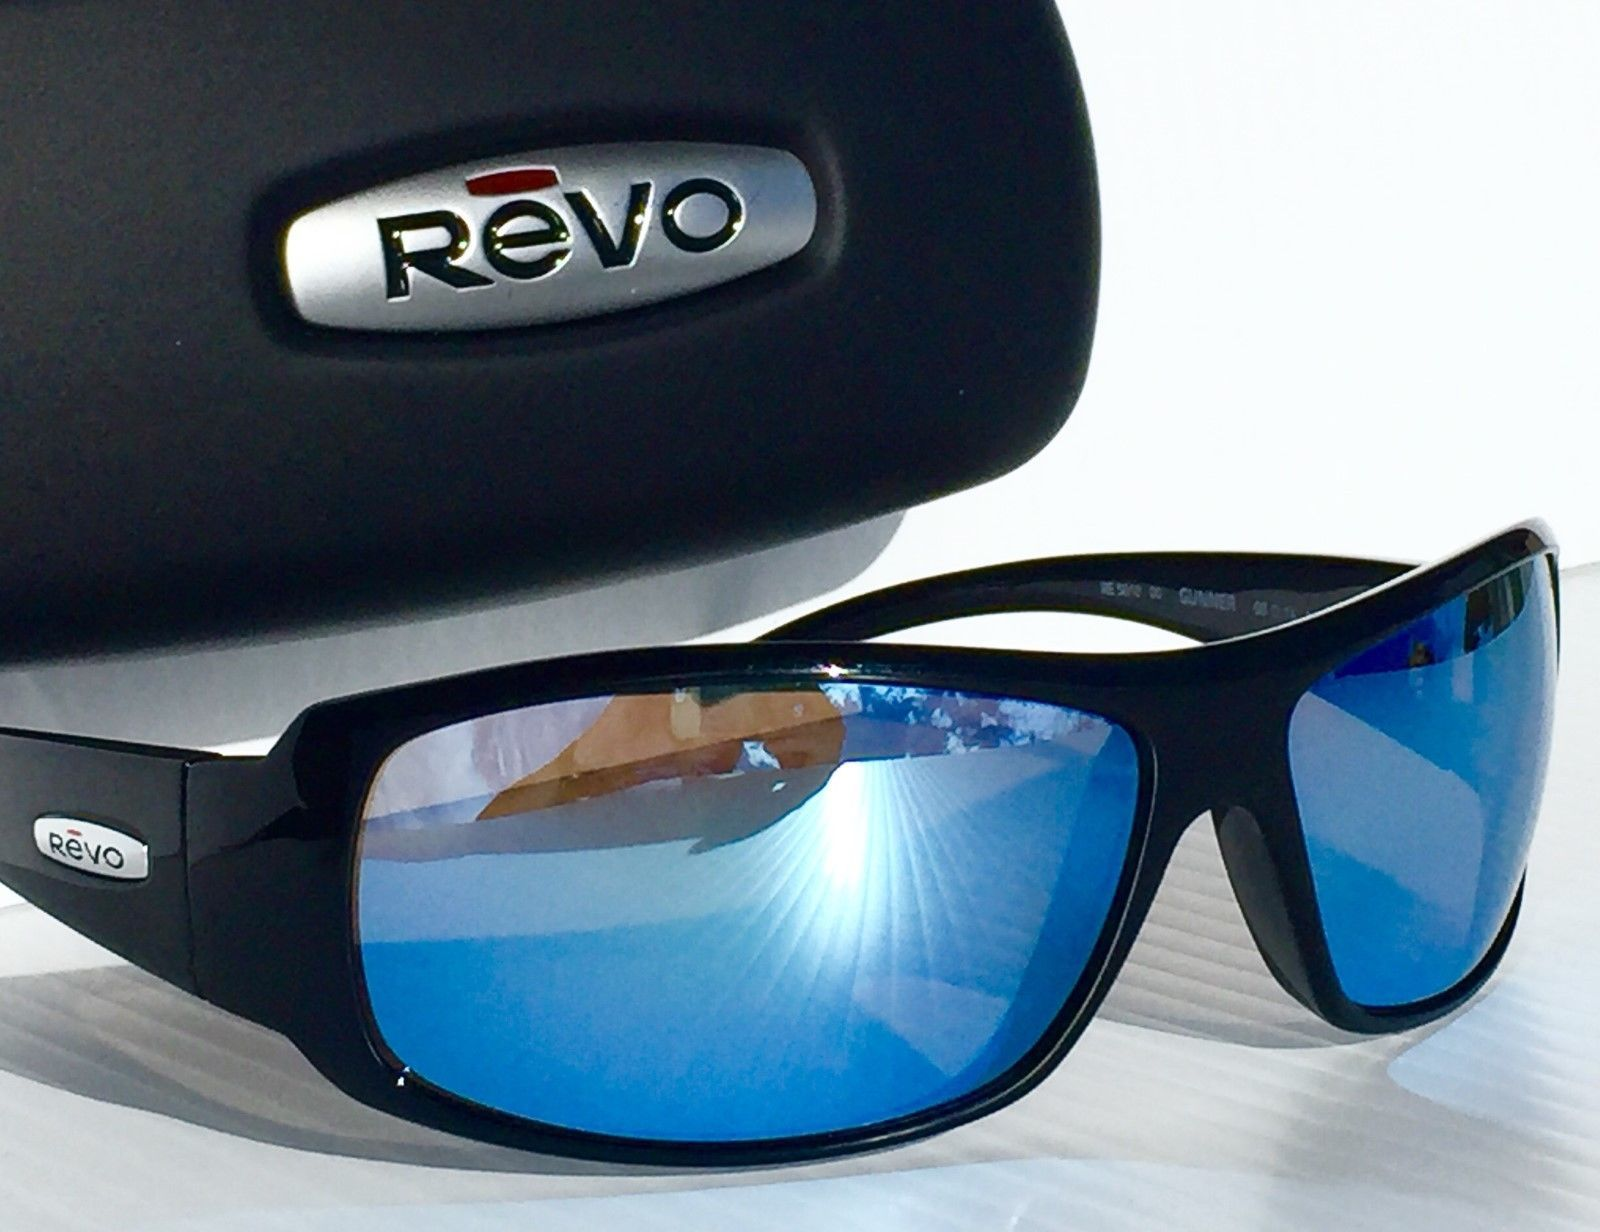 5e027fb10c8d REVO GUNNER BLACK w POLARIZED Blue Water Lens Sunglass 5010 00 BL (eBay  Link)